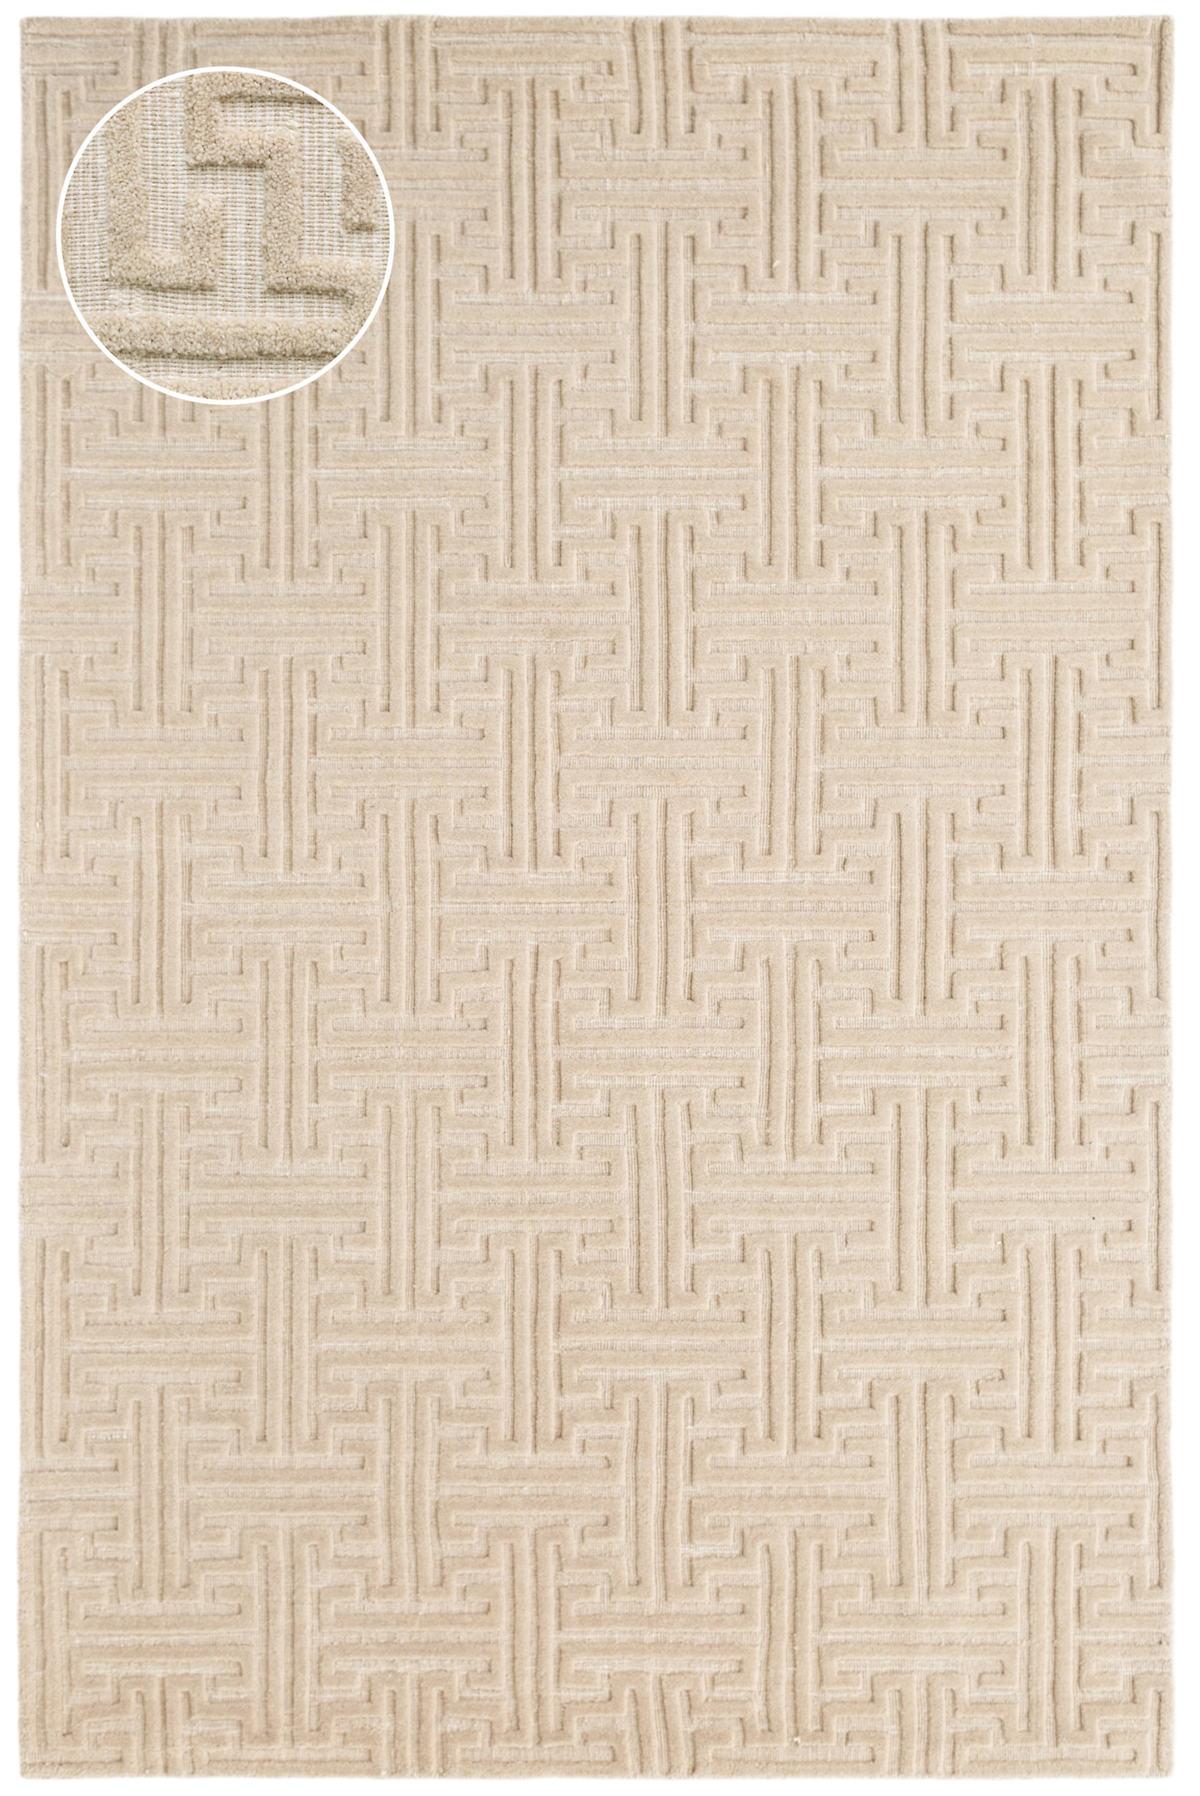 Beekman Sandstone Jacquard Loom Knotted Rug